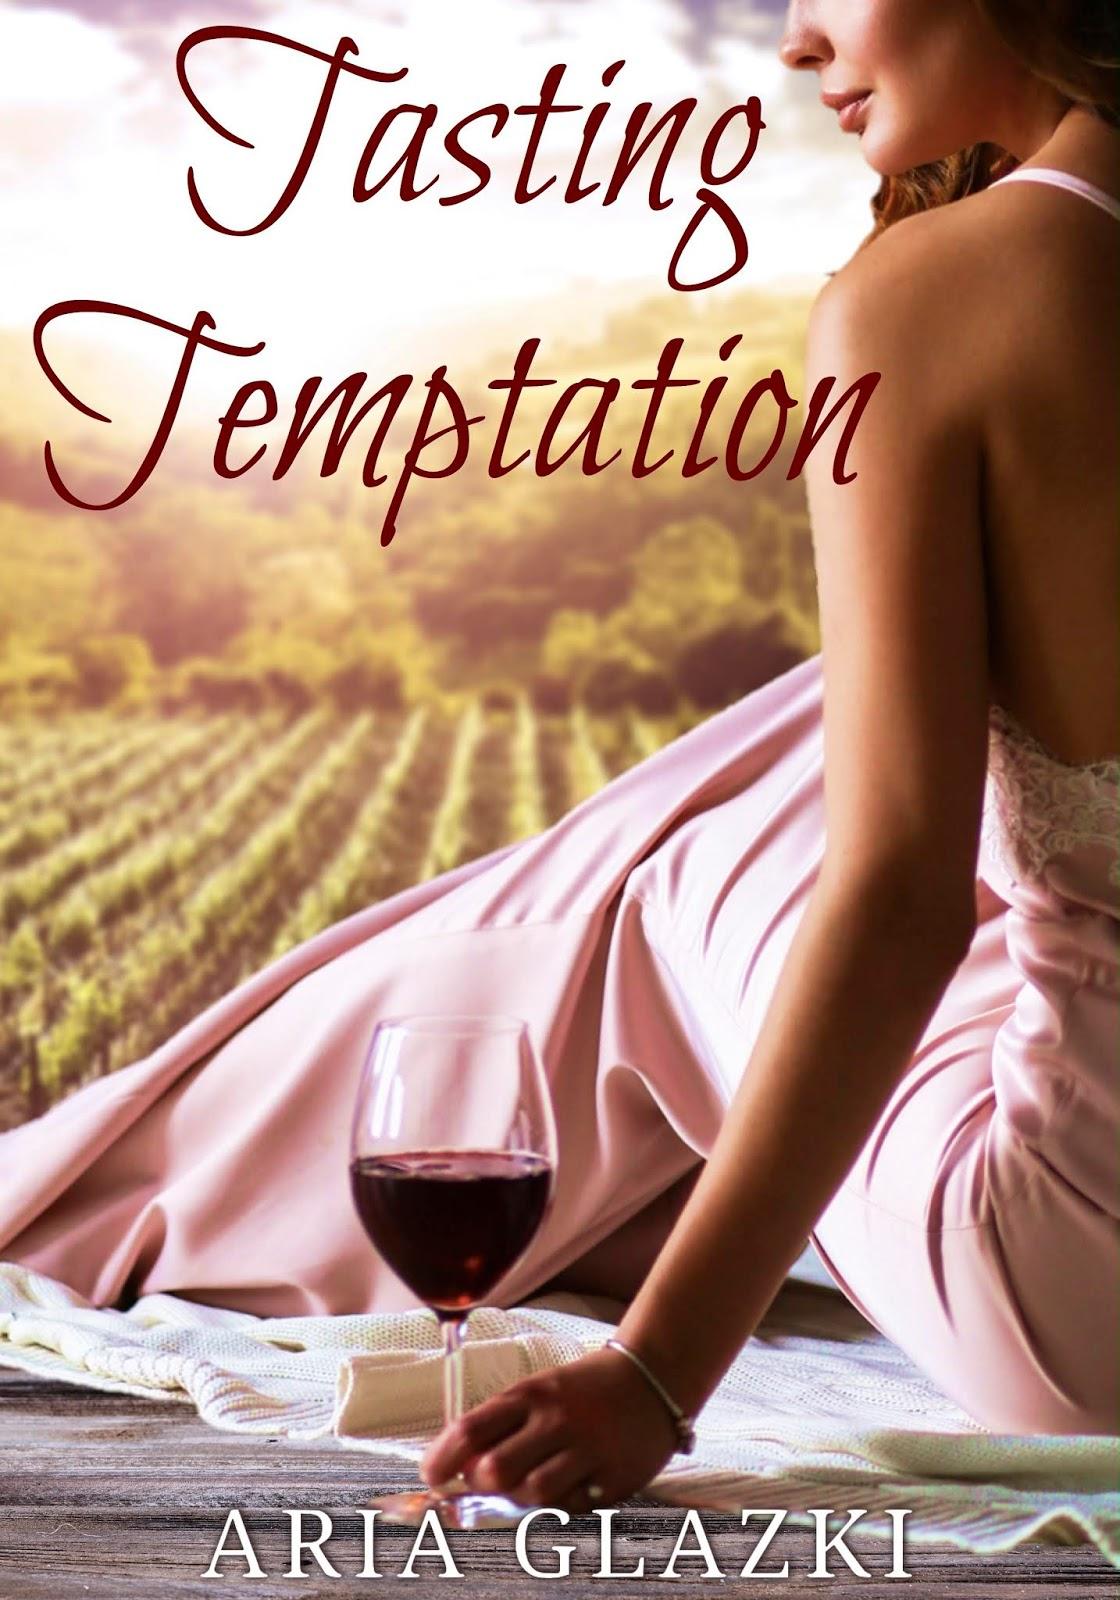 Book cover of Tasting Temptation by Aria Glazki